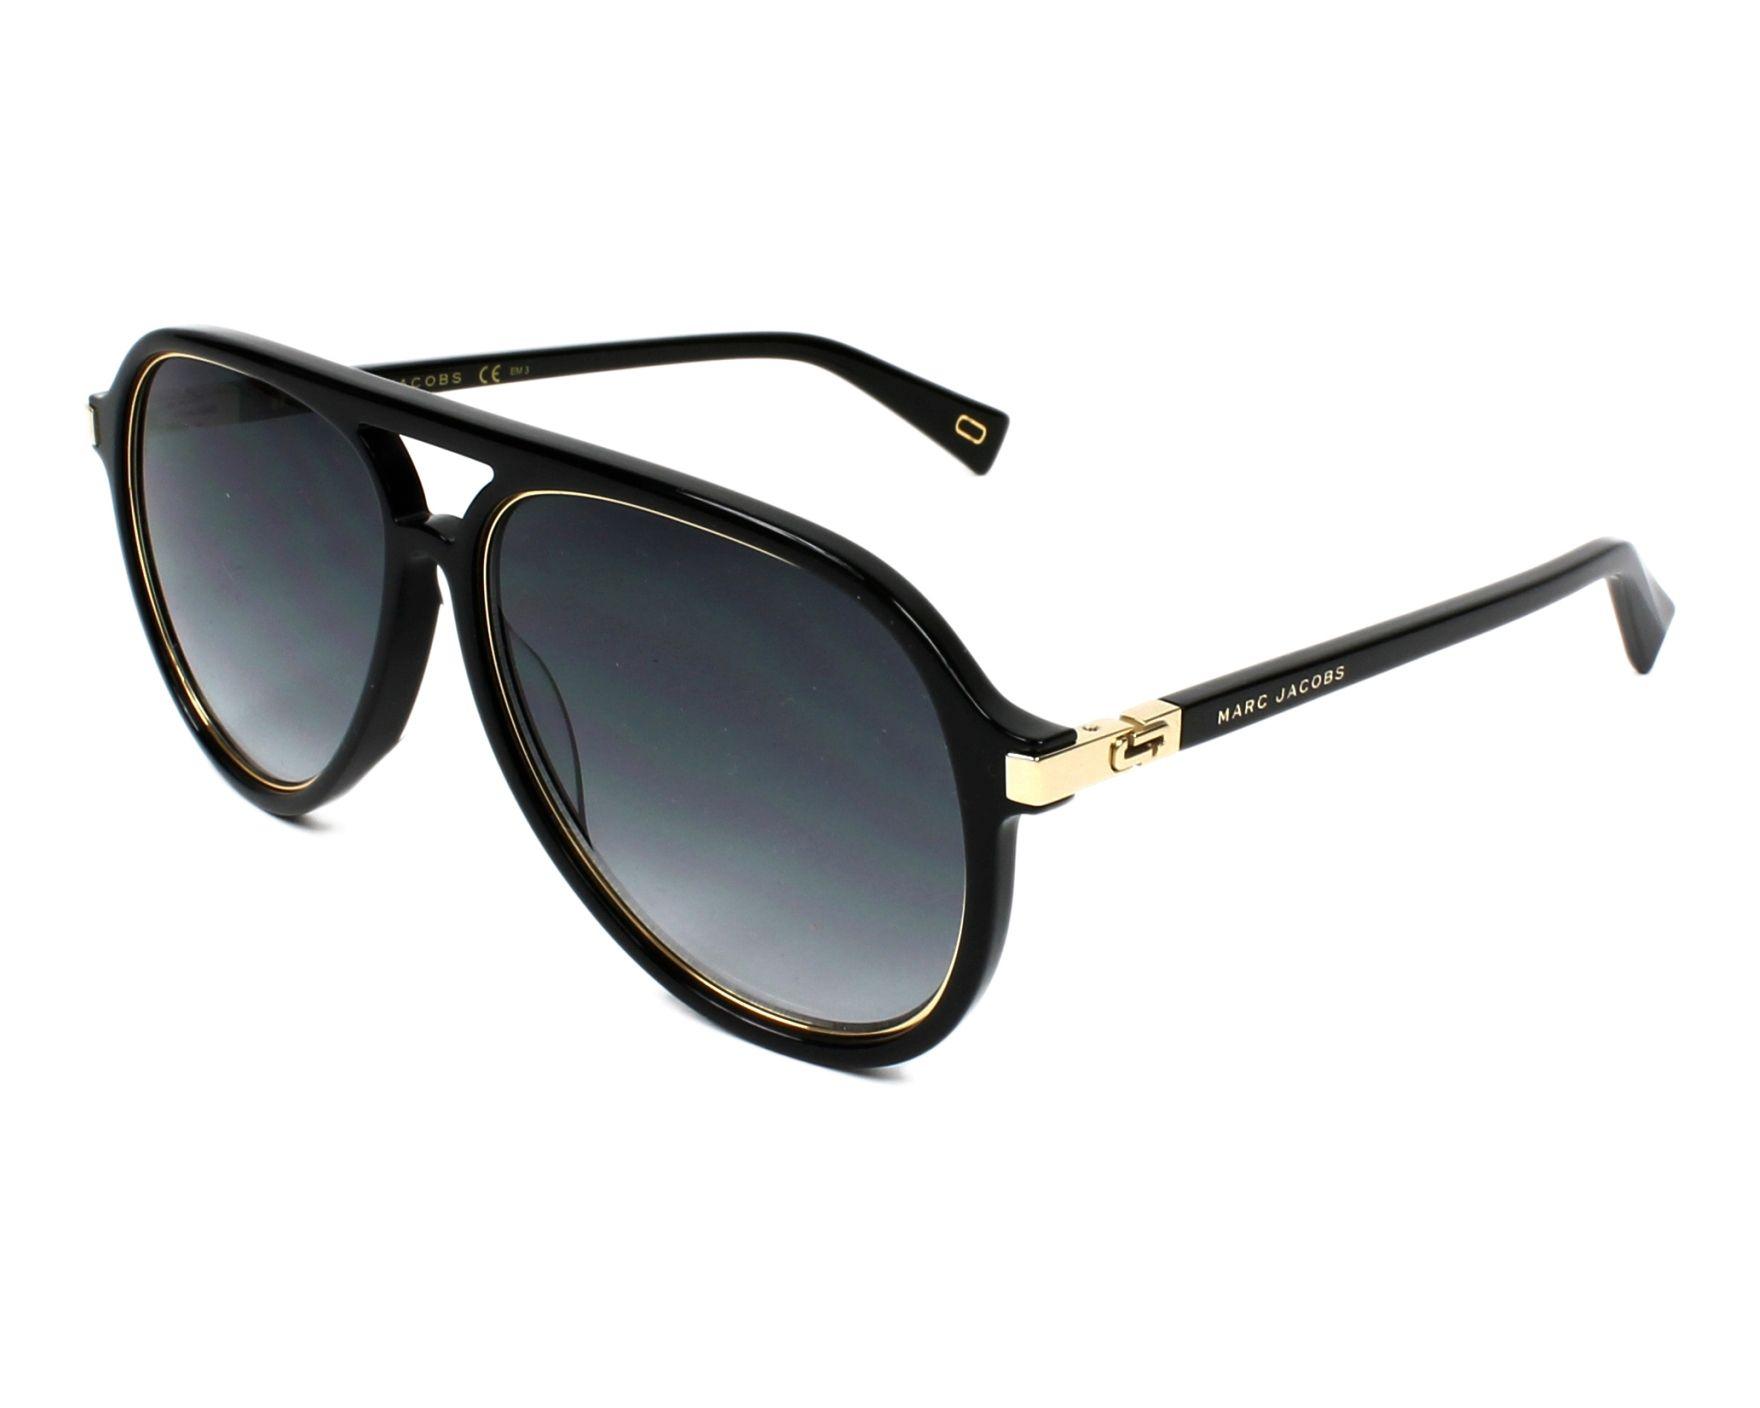 80e31021e1 Sunglasses Marc Jacobs MARC-174-S 2M2 9O 58-14 Black Gold